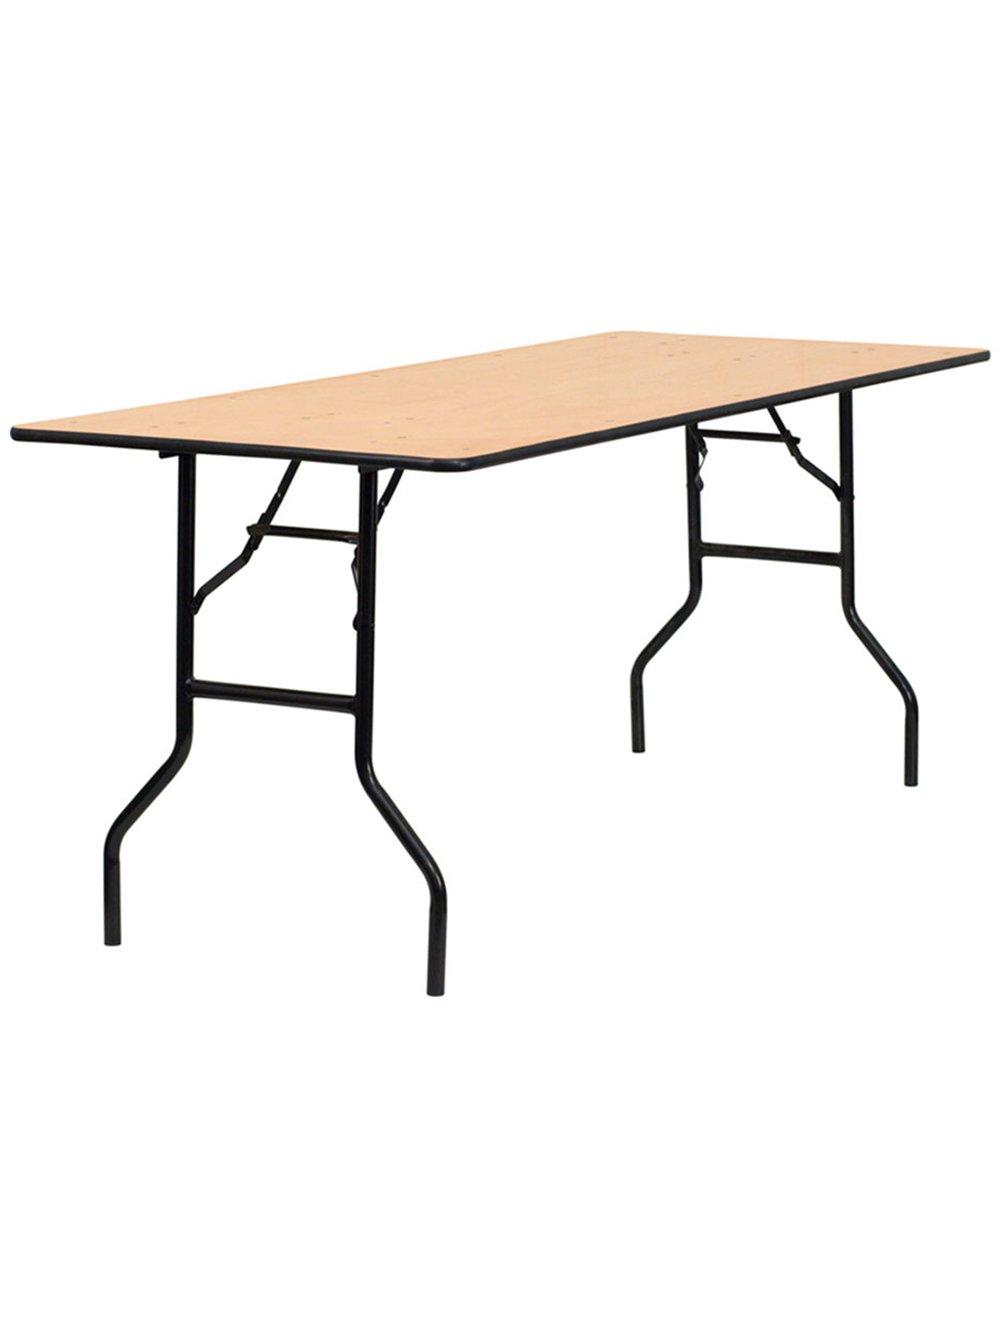 Rectangular wooden trestle table